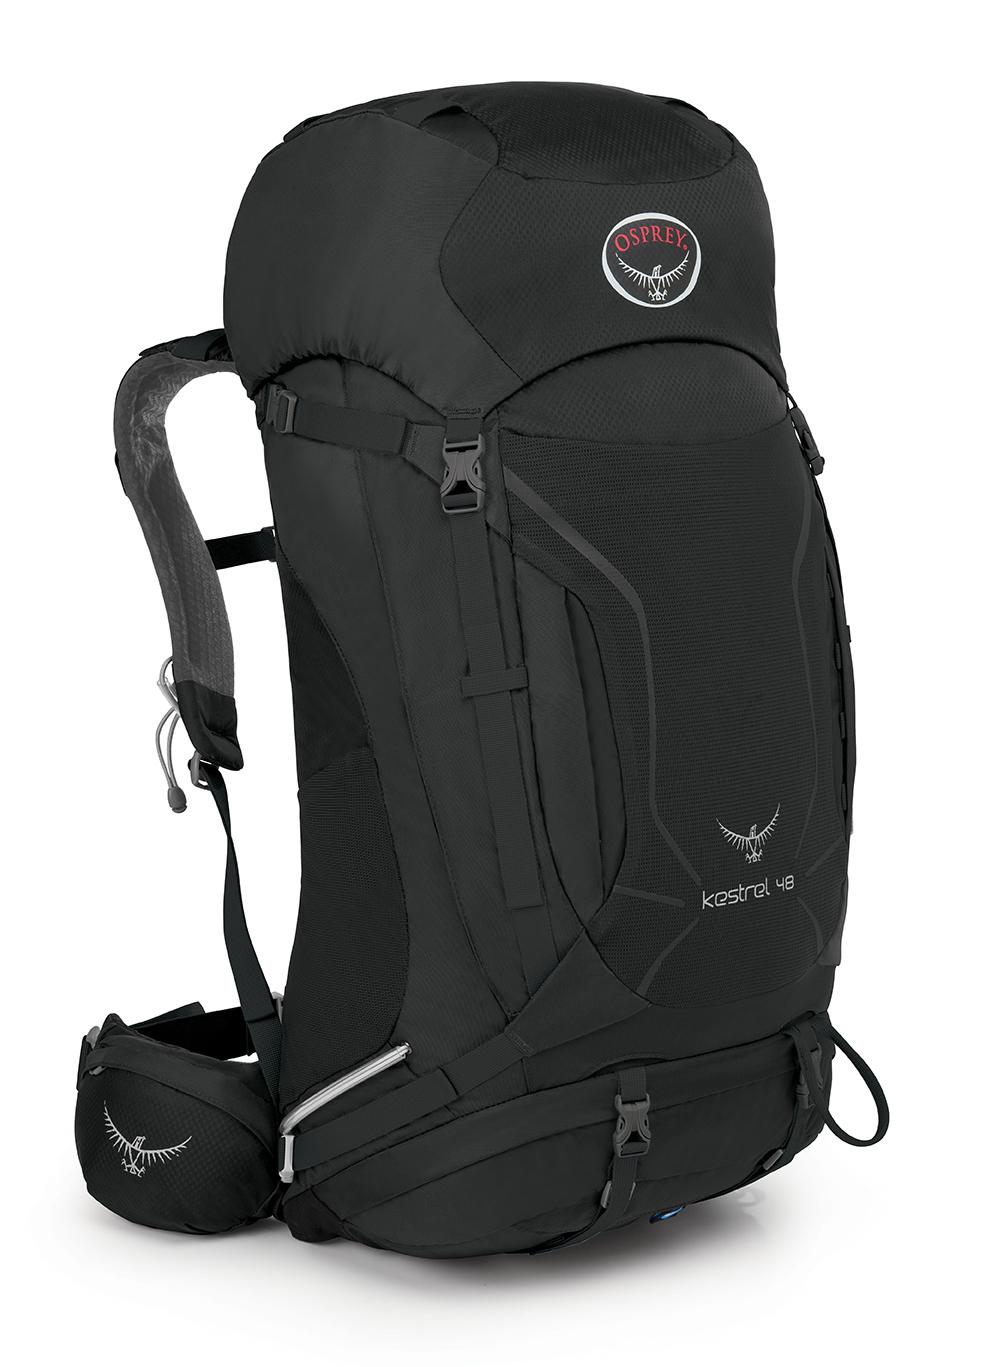 Osprey Kestrel 48 - Sac à dos randonnée homme